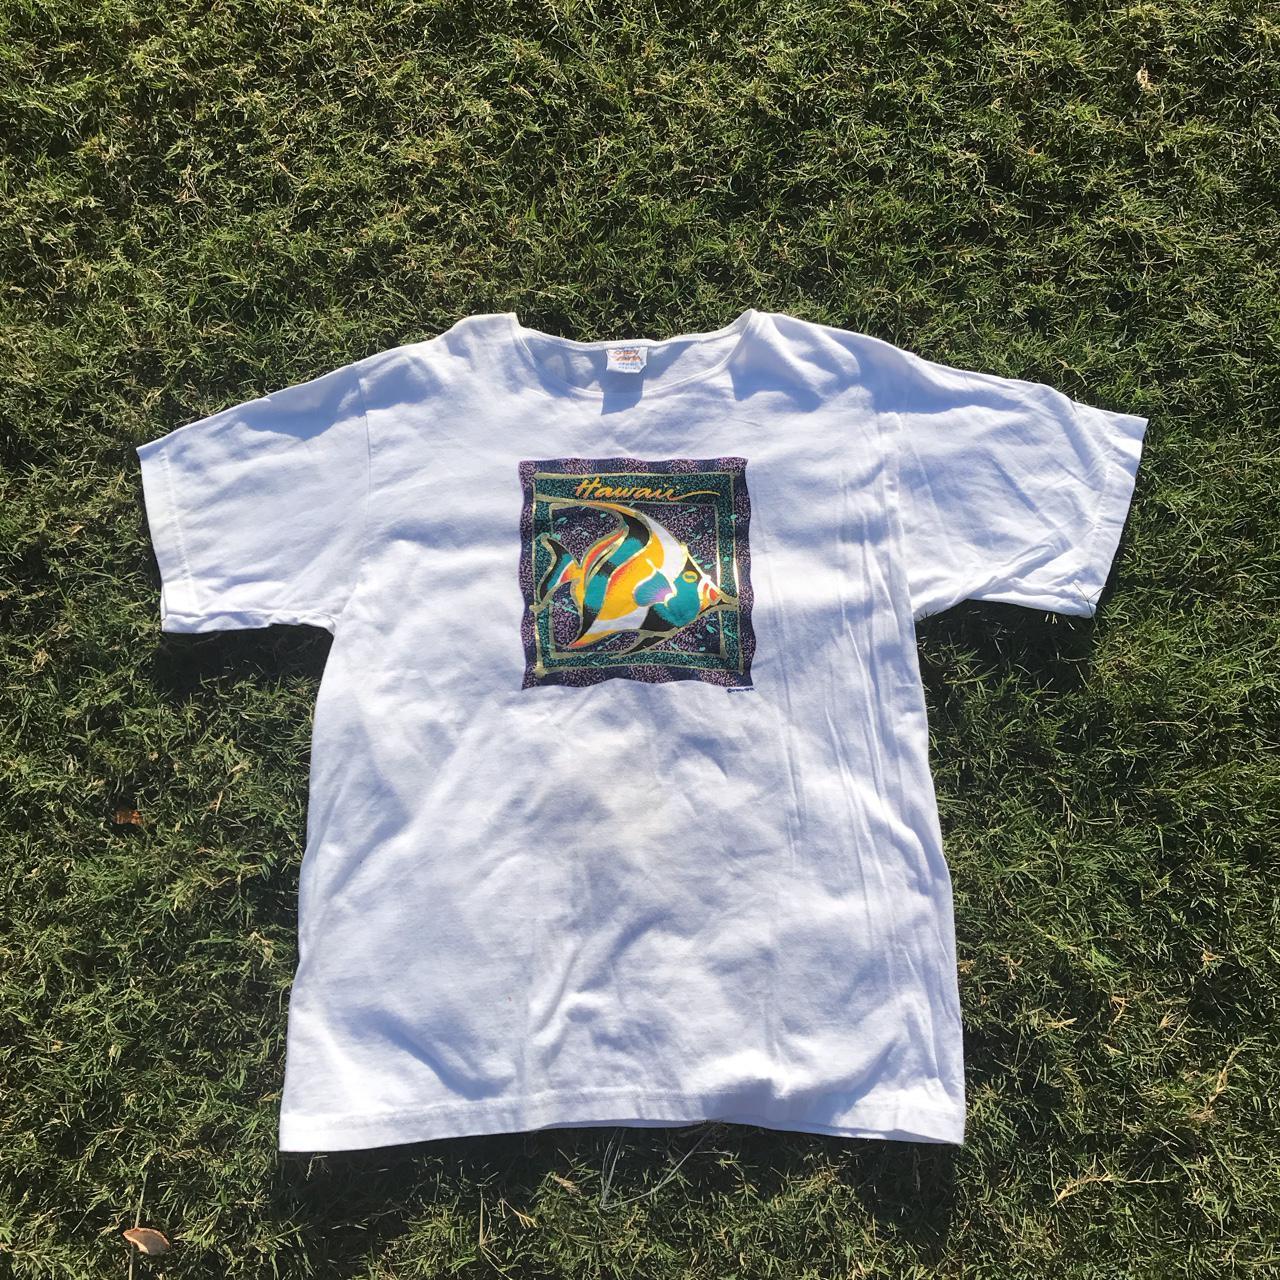 Product Image 1 - Crazy shirt Hawaii!  Vintage Hawaii t-shirt